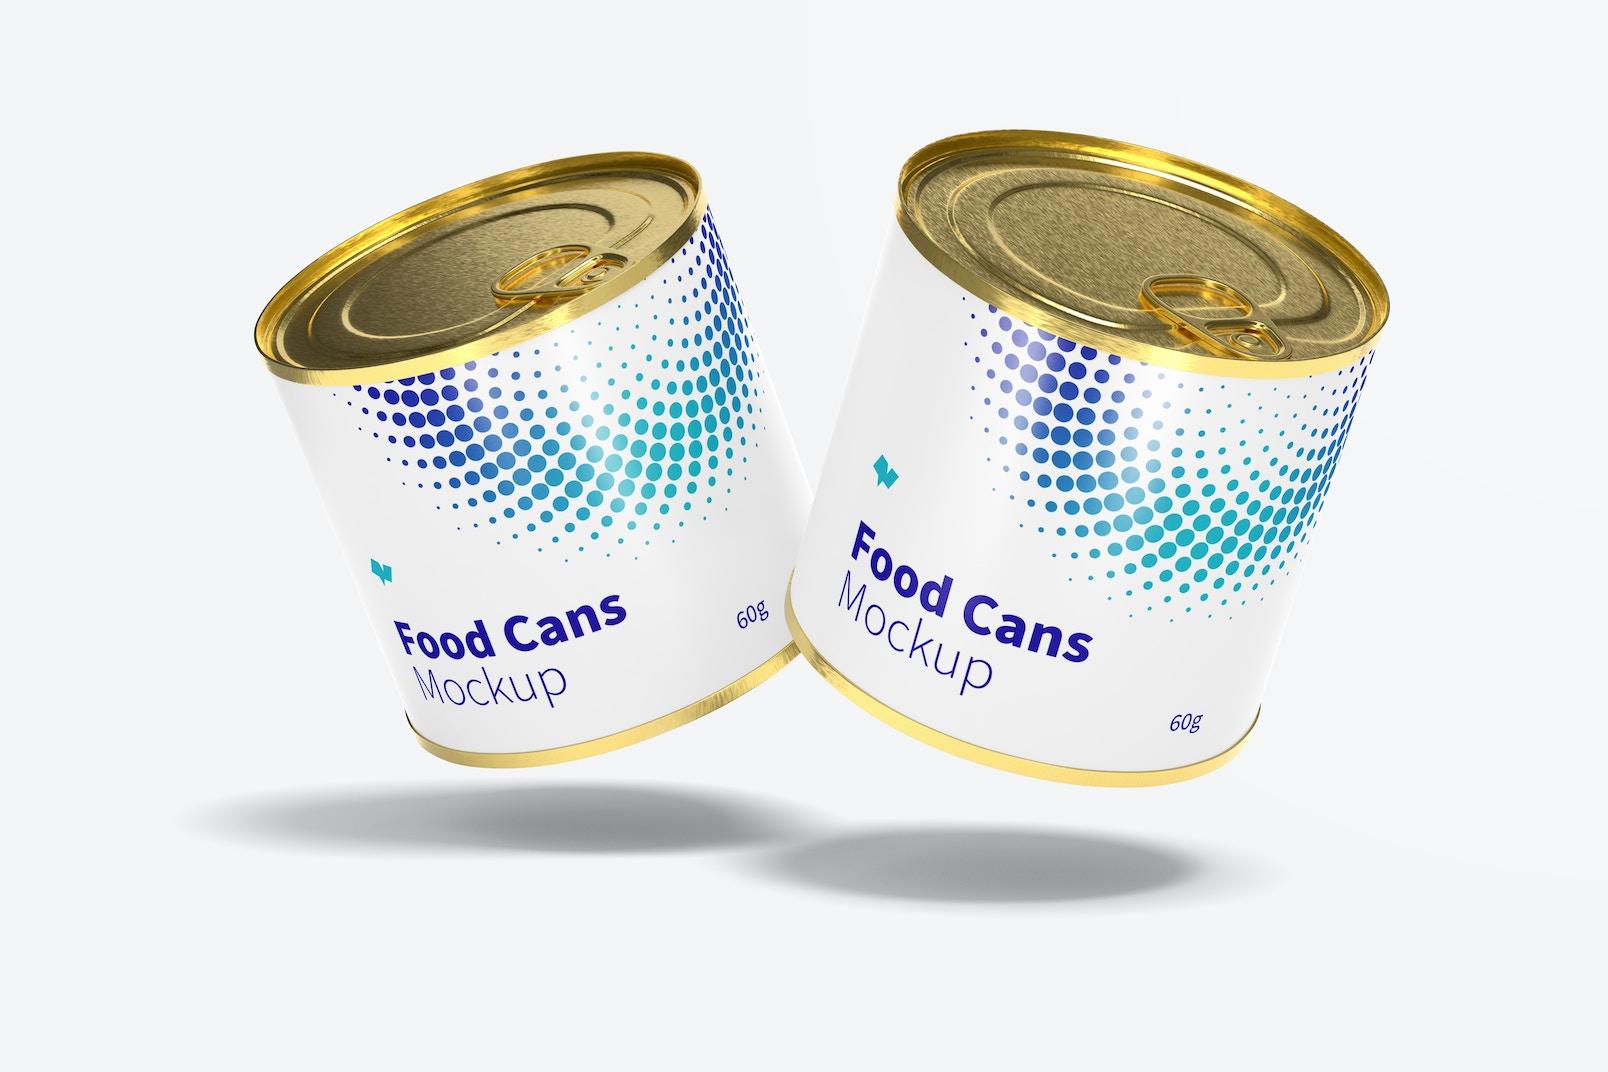 60g Food Cans Mockup, Floating